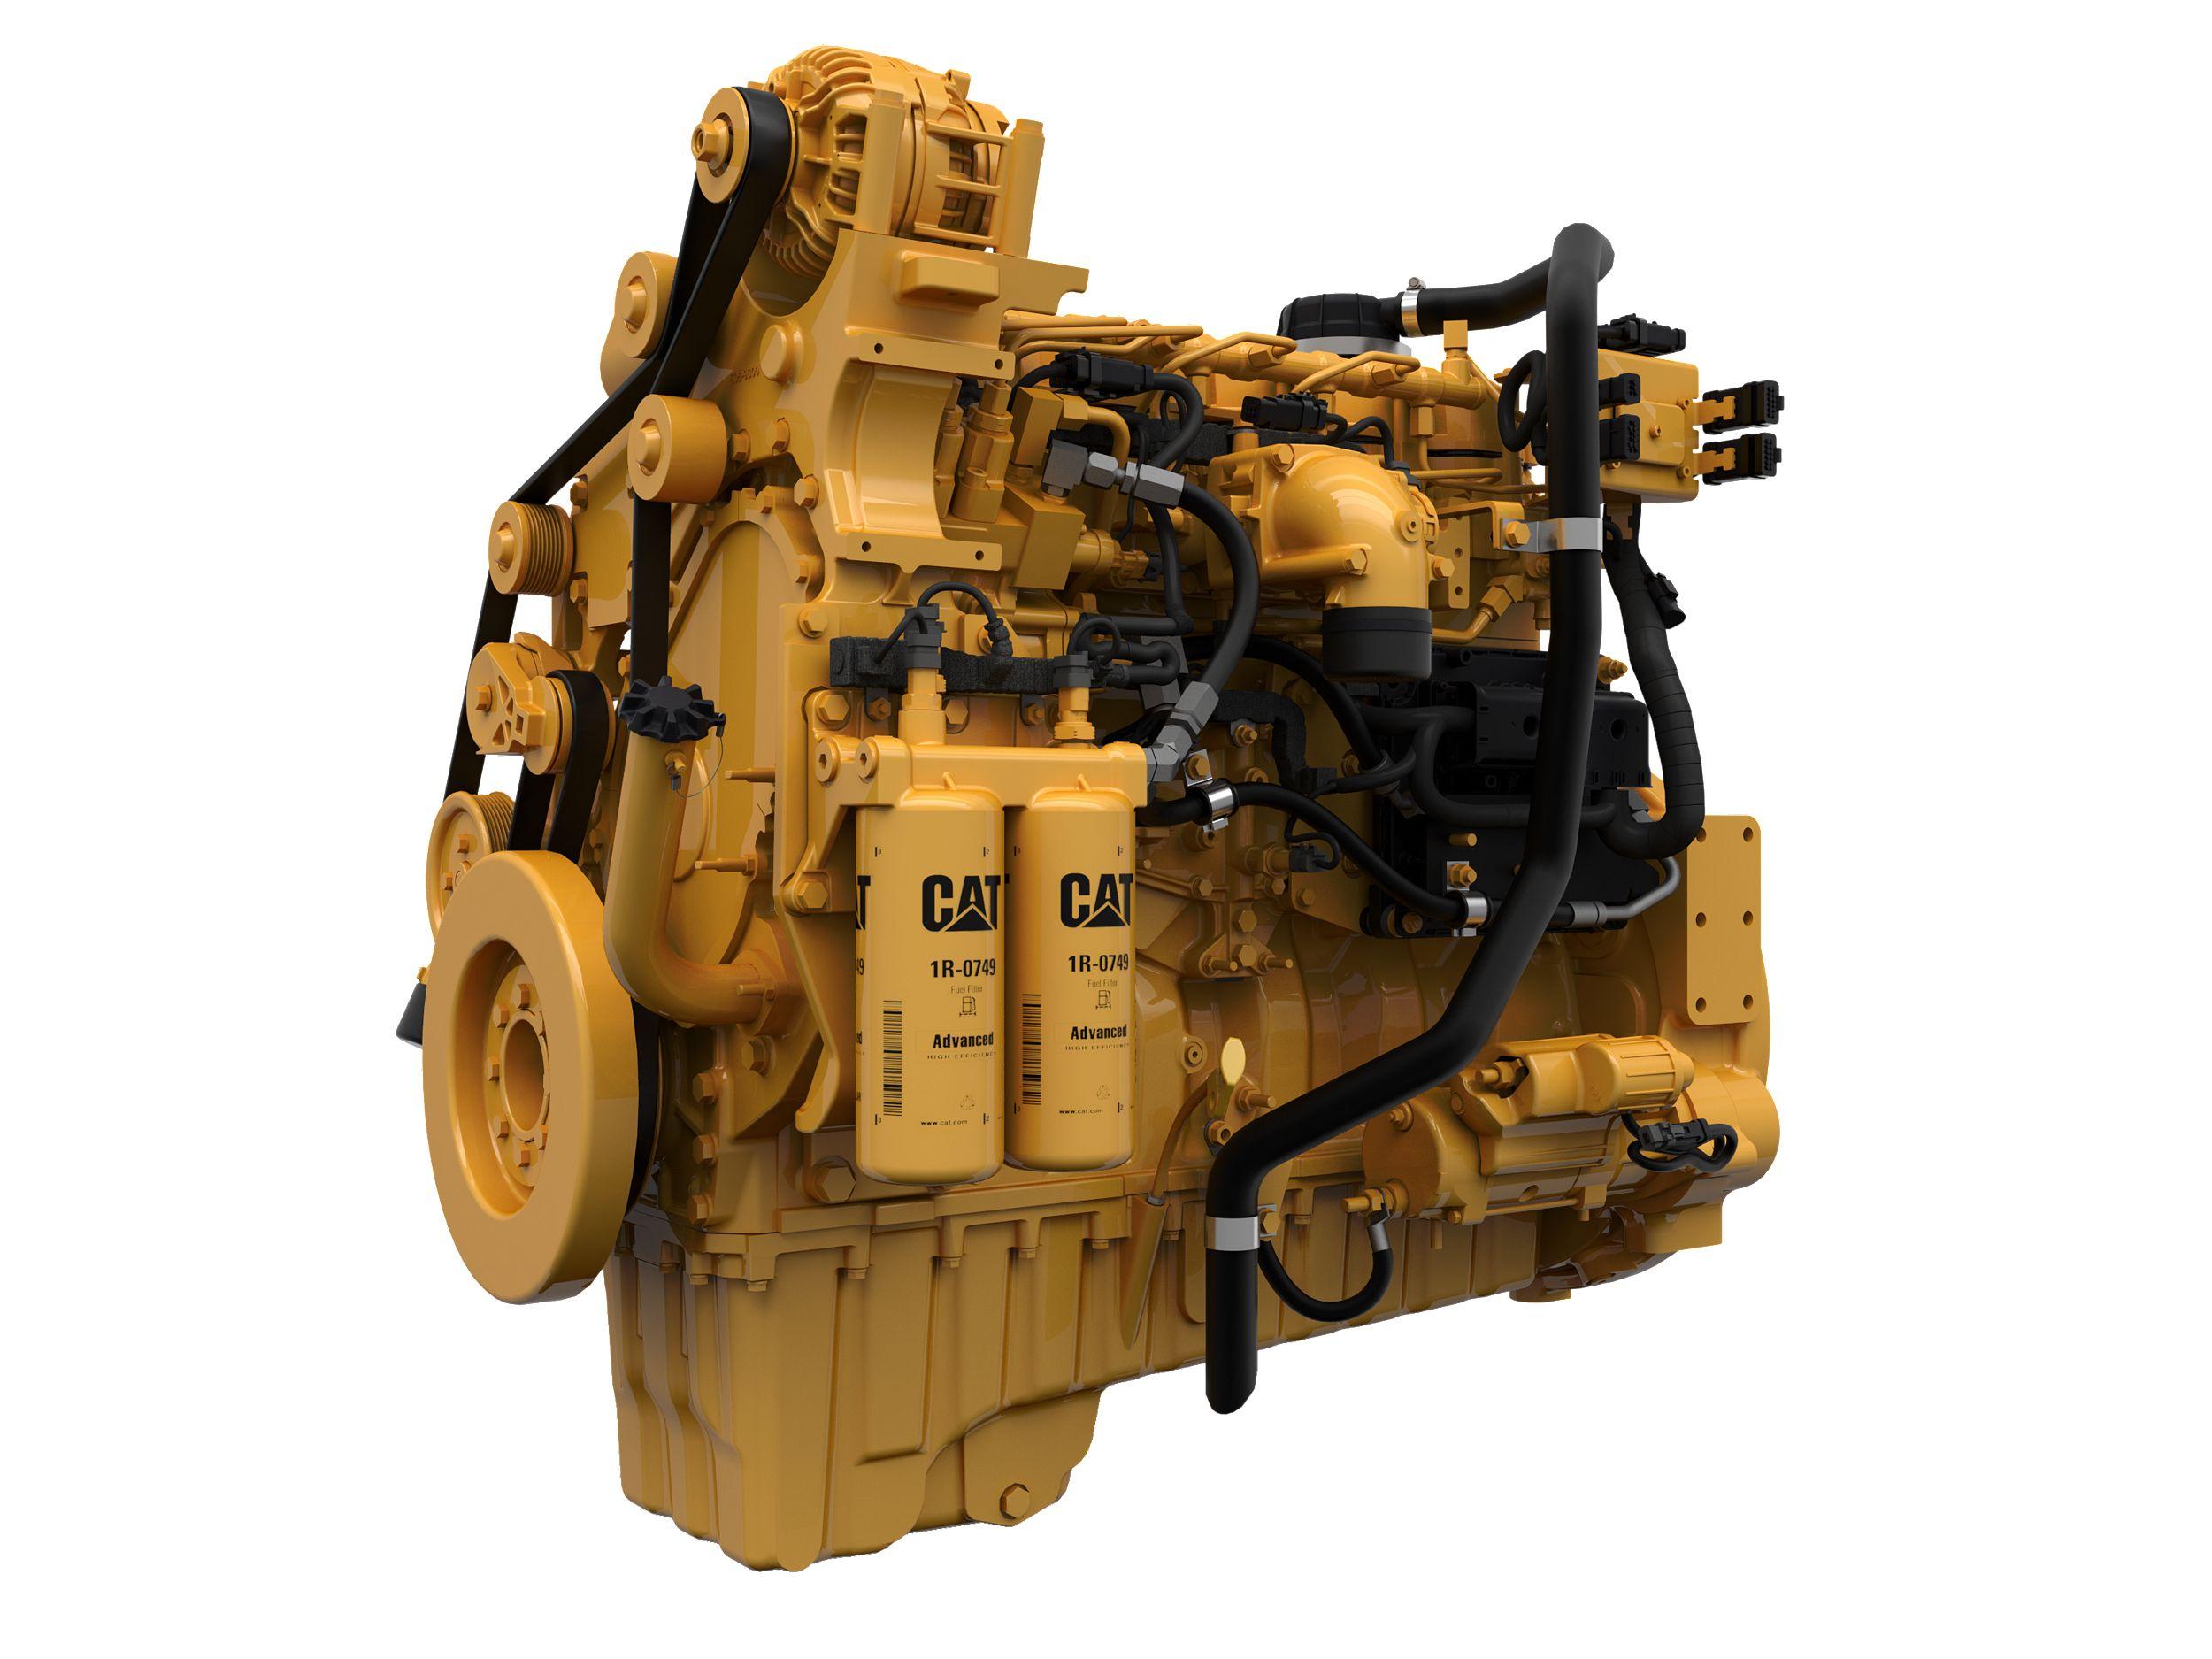 C9.3B Tier 4 Diesel Engines – Highly Regulated